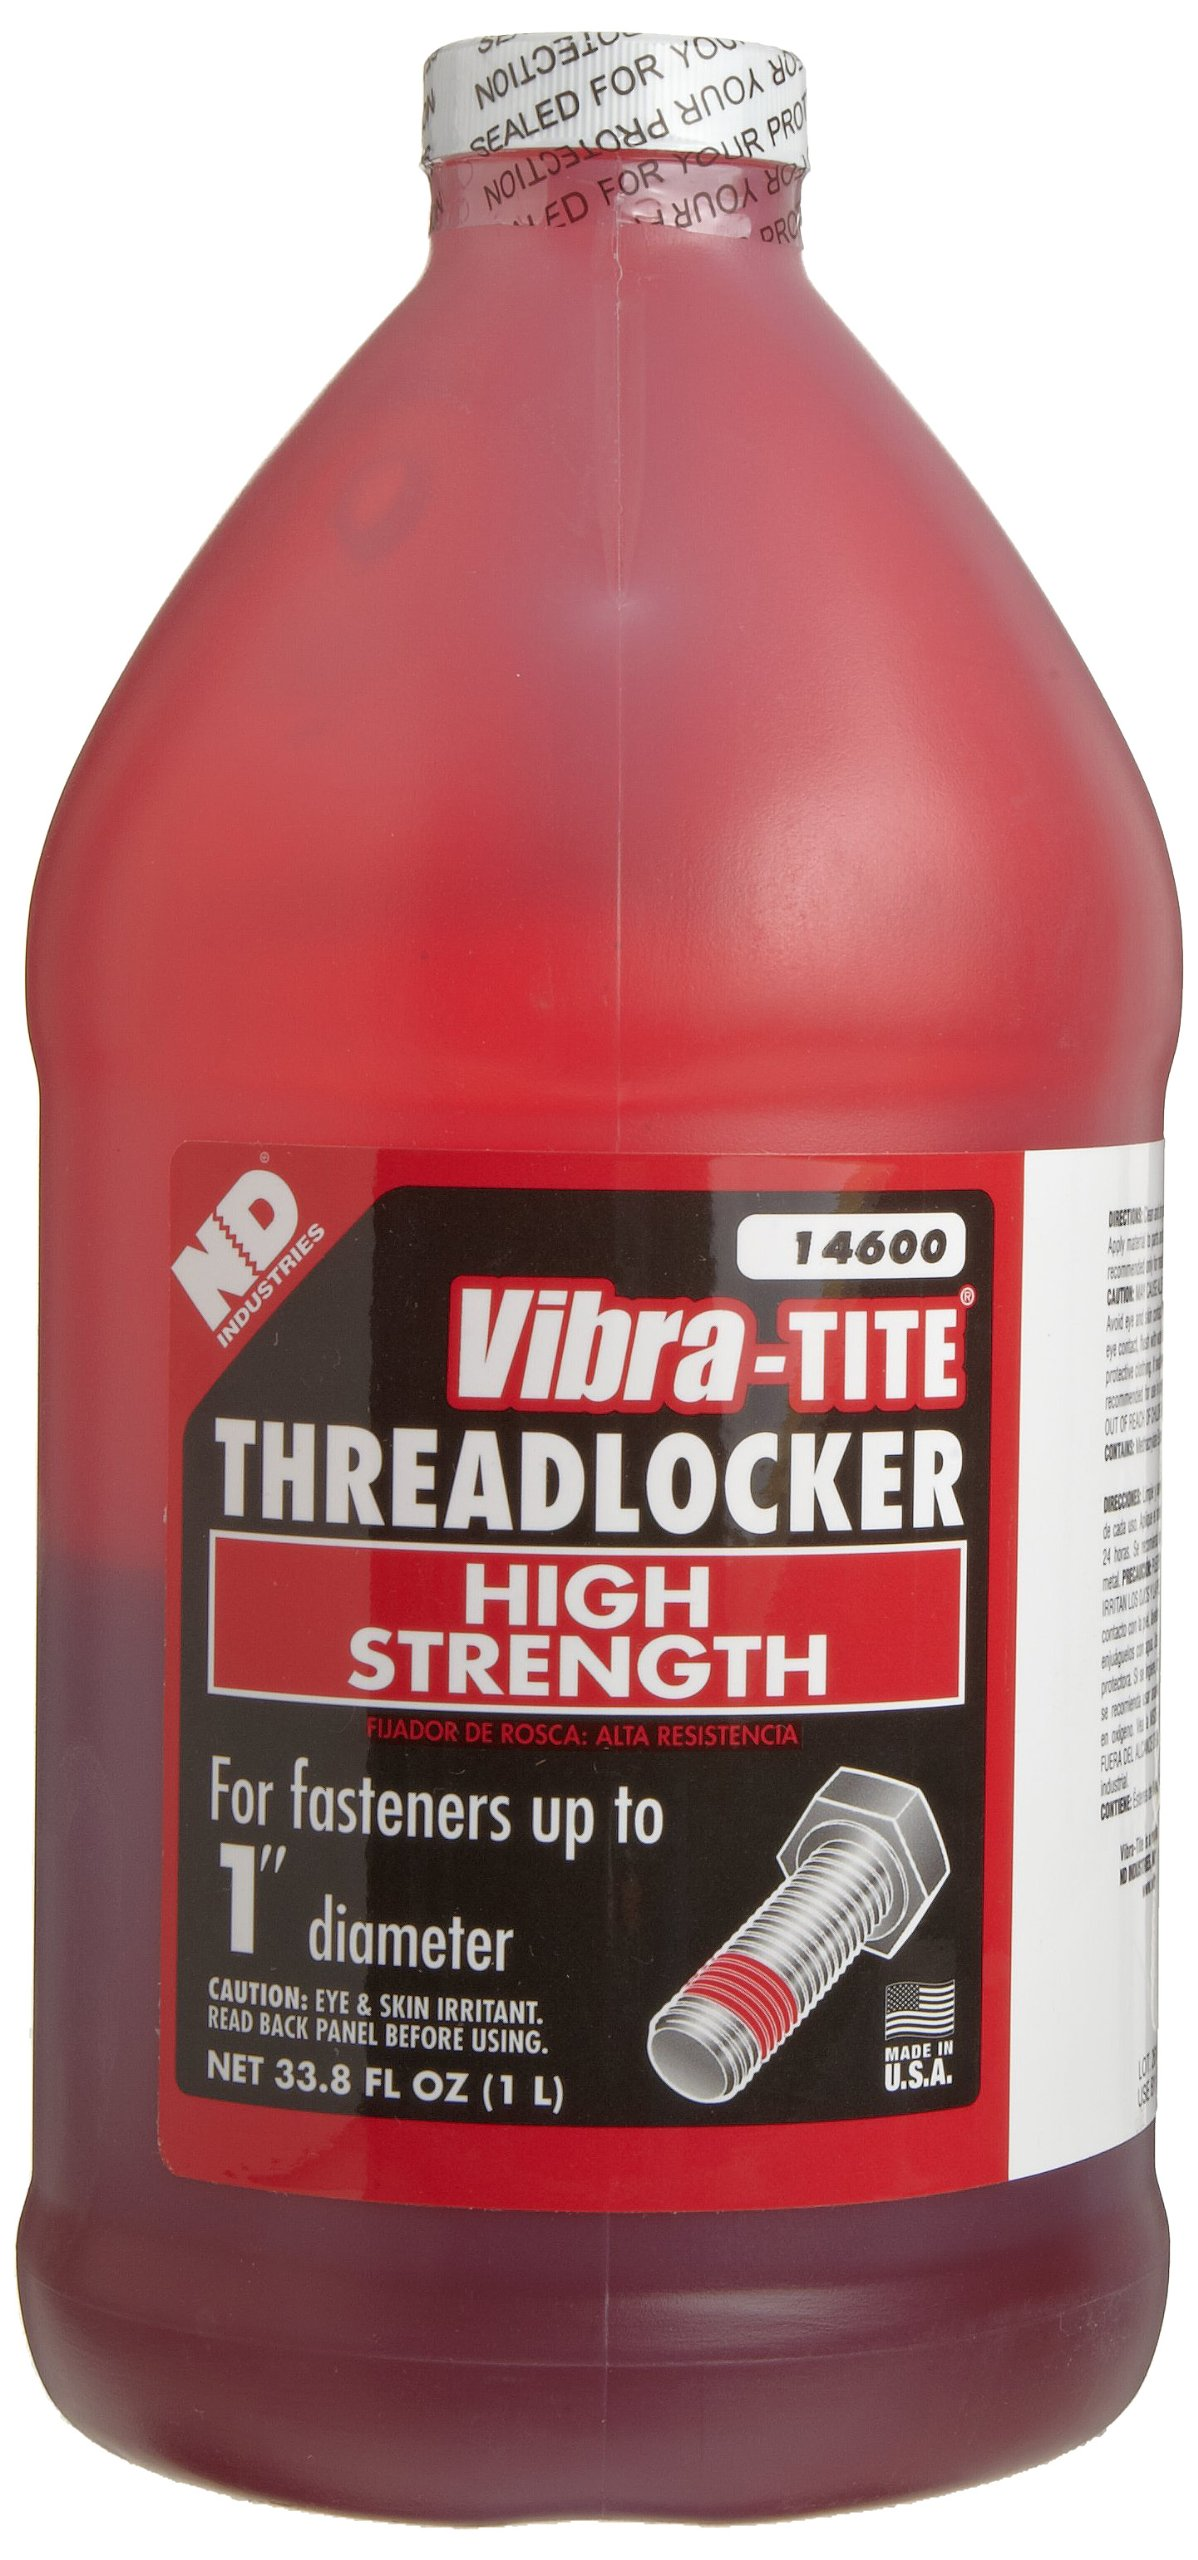 Vibra-TITE 146 Permanent Large Diameter High Strength Anaerobic Threadlocker, 1 liter Jug, Red by Vibra-TITE